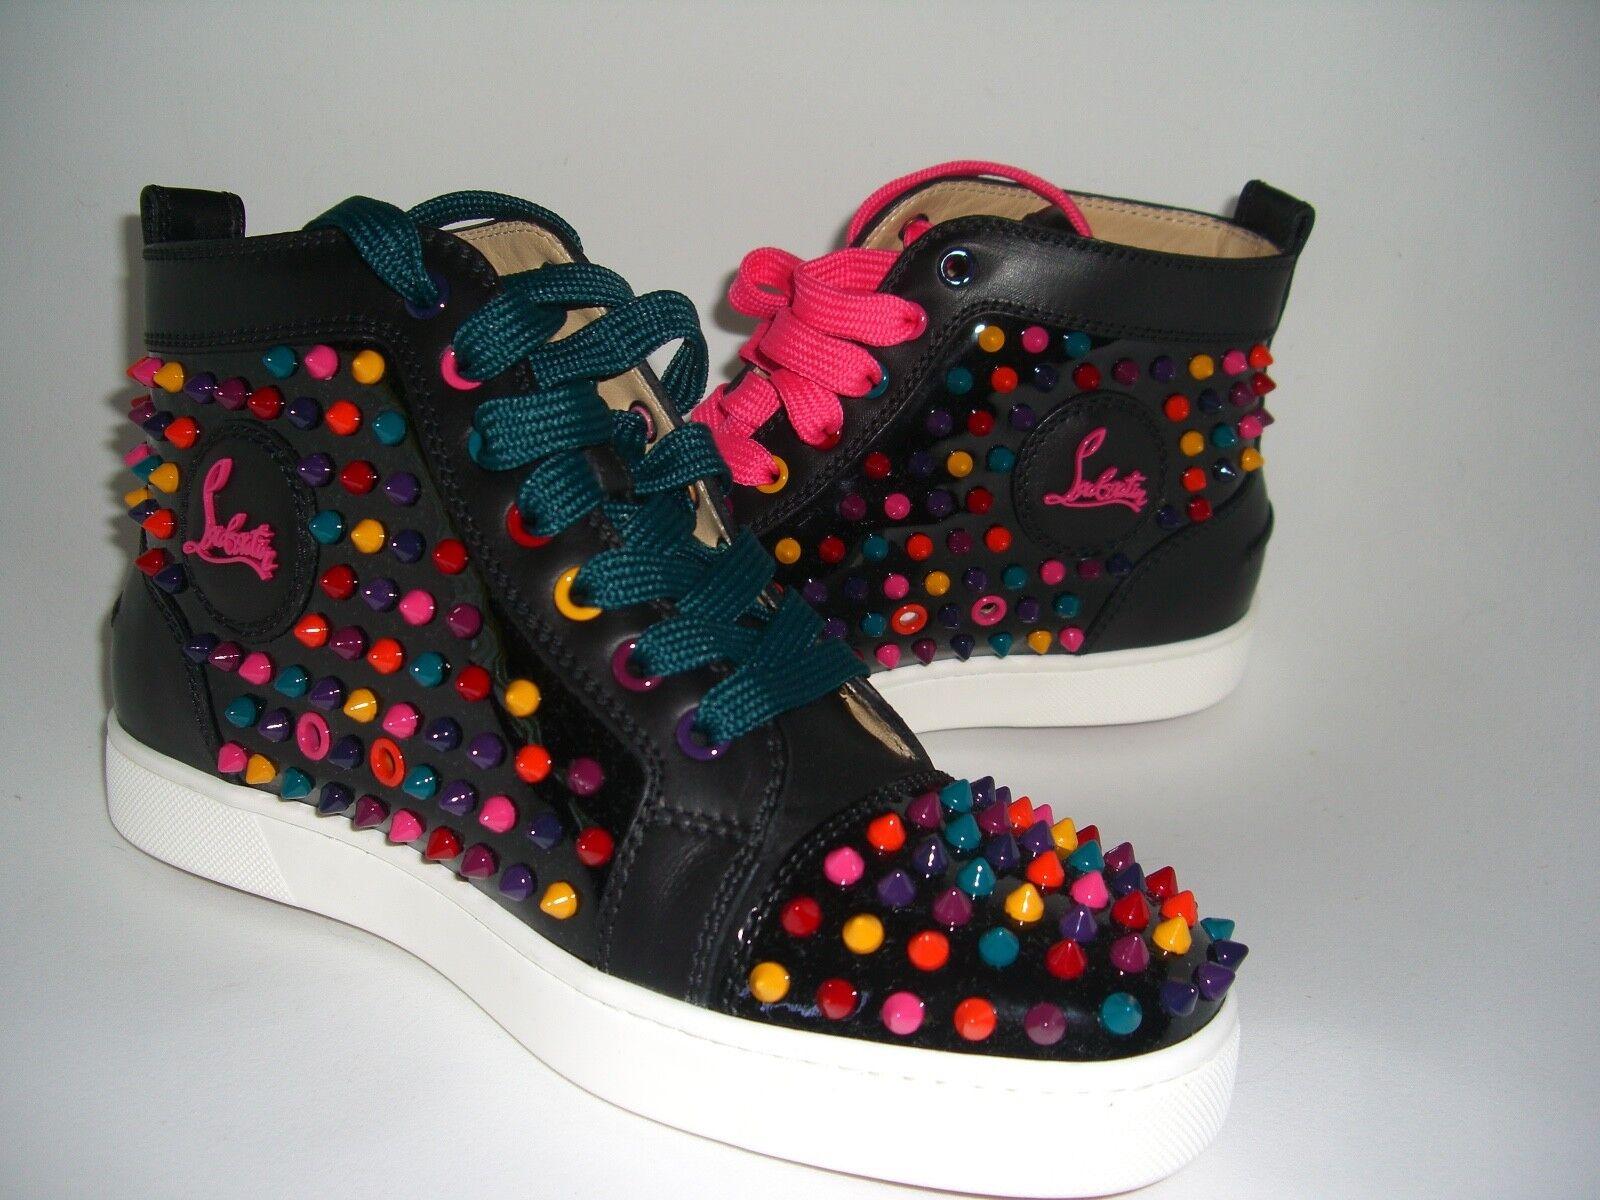 Scarpe casual da uomo  NIB Christian Louboutin wouomos flat patent calf spikes sneaker 39 Sold Out